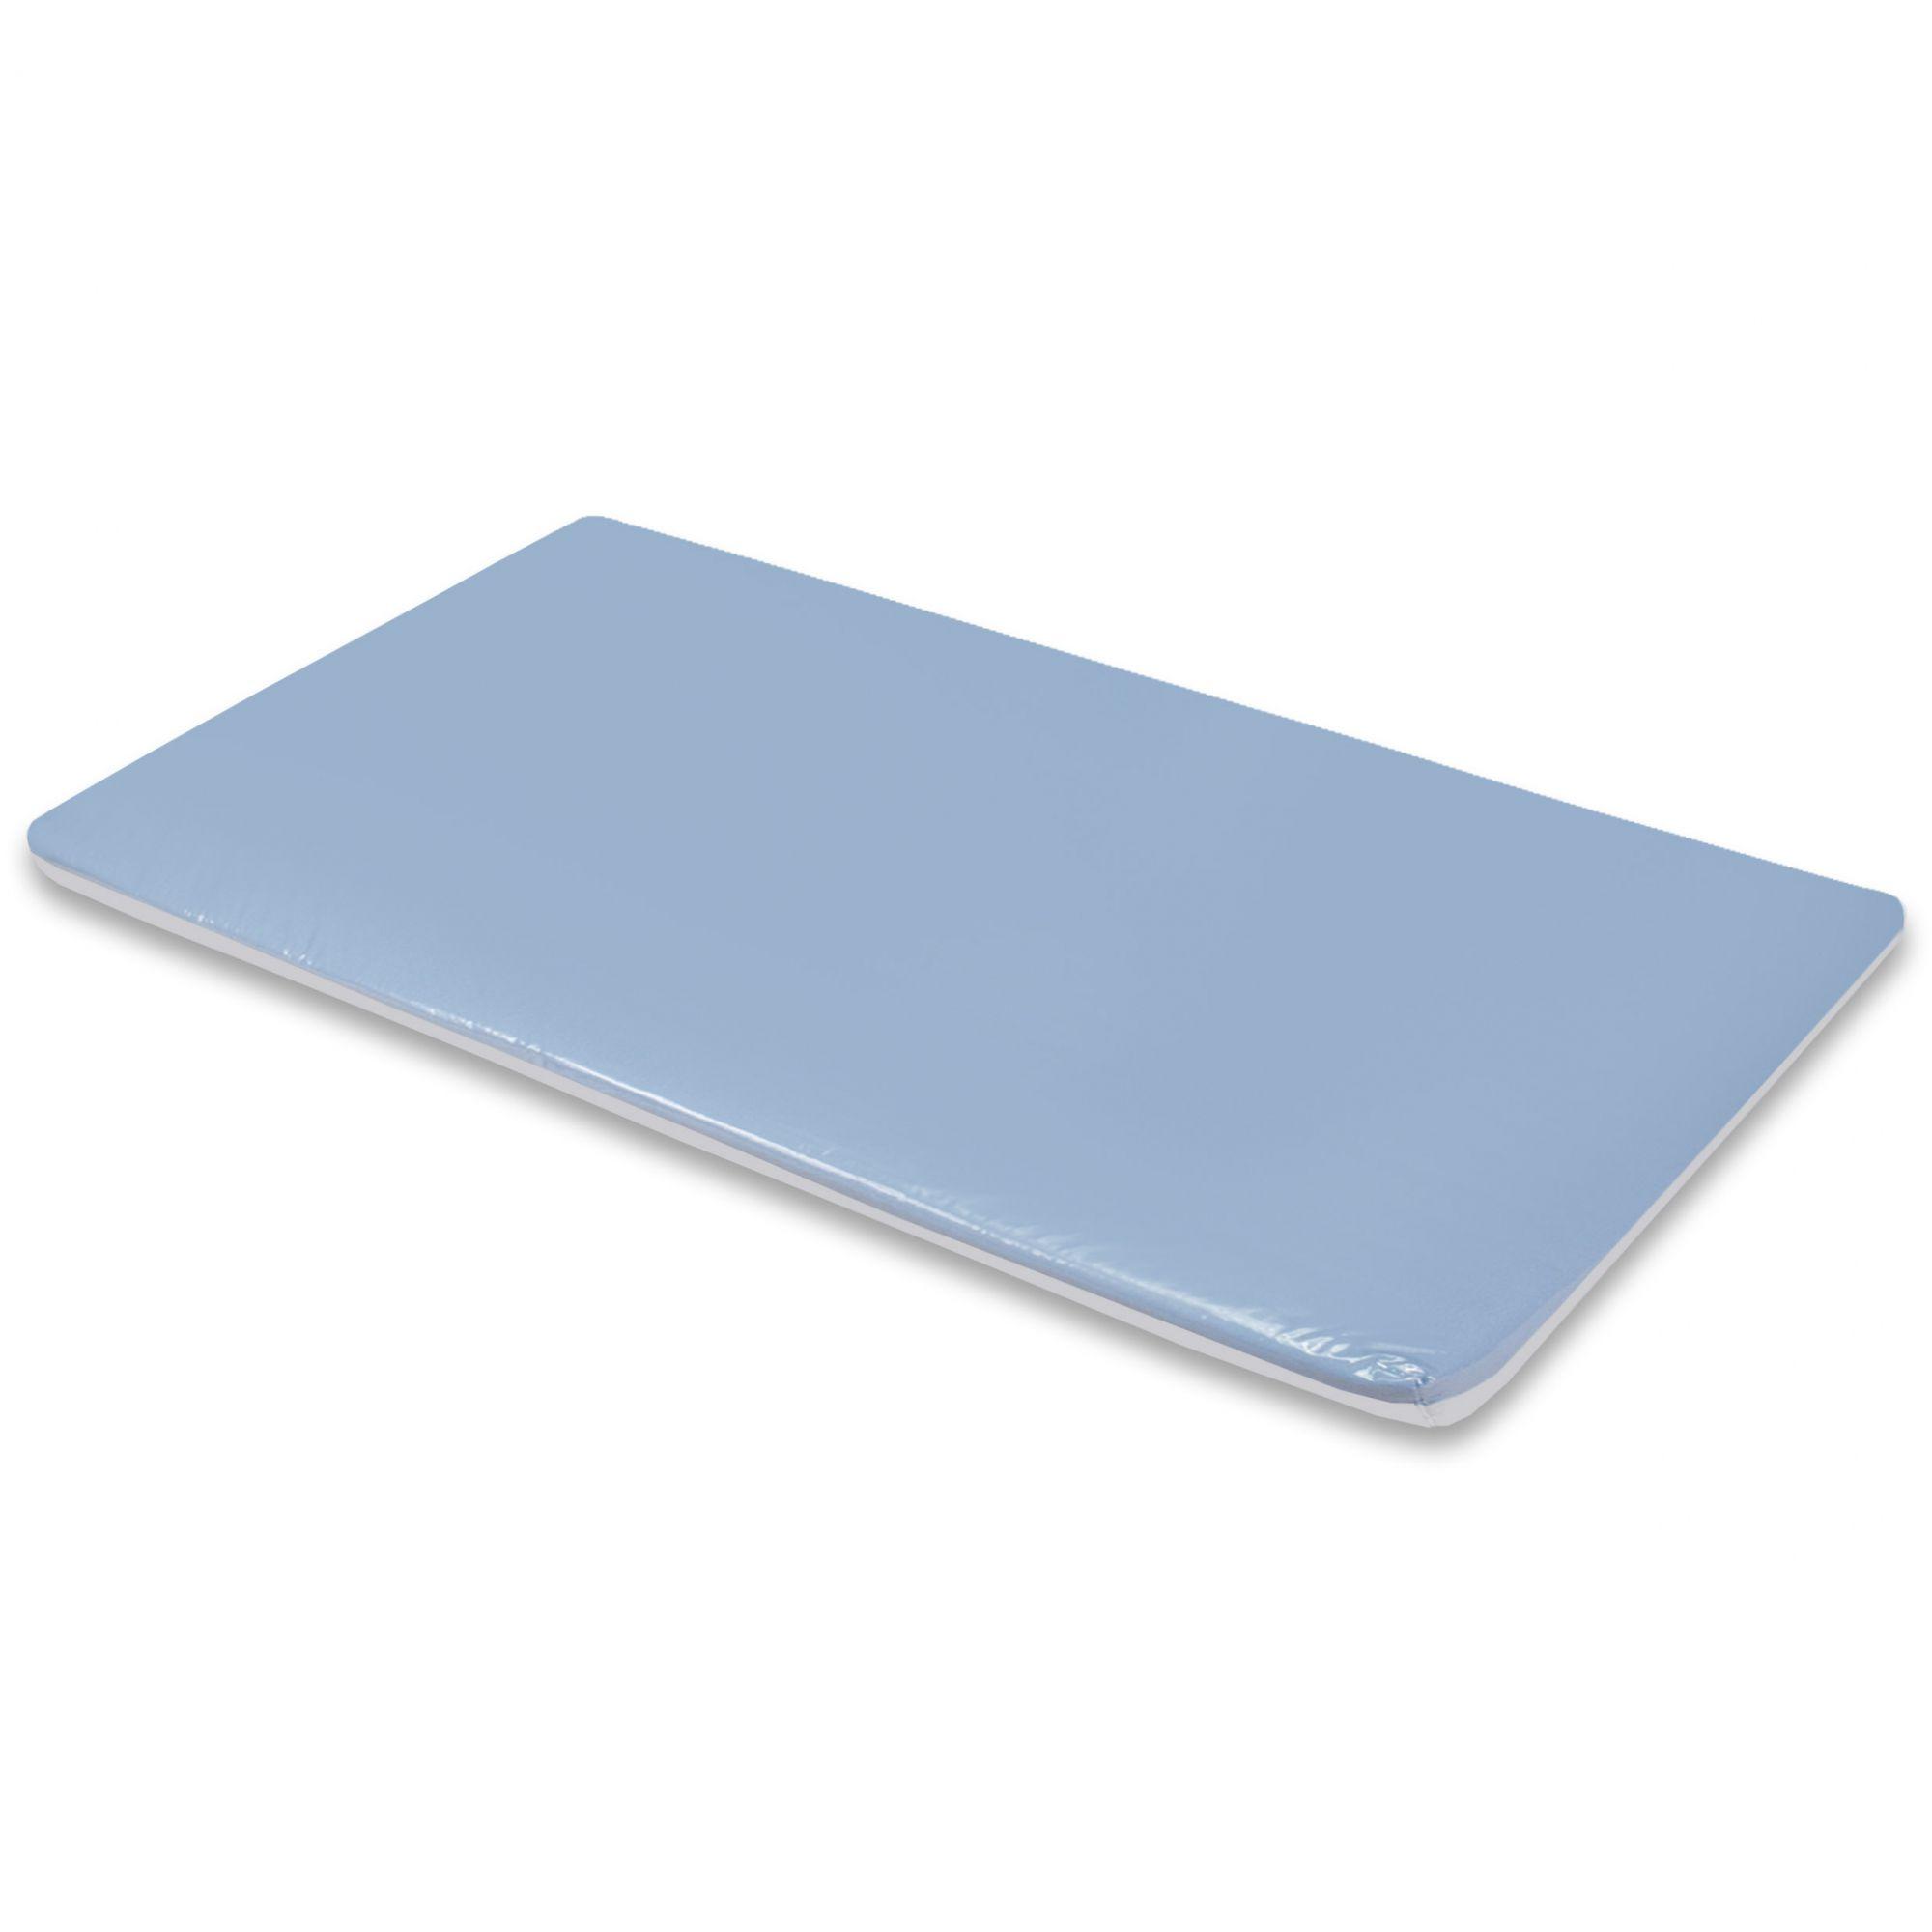 Trocador de Cômoda - Azul c/ Branco